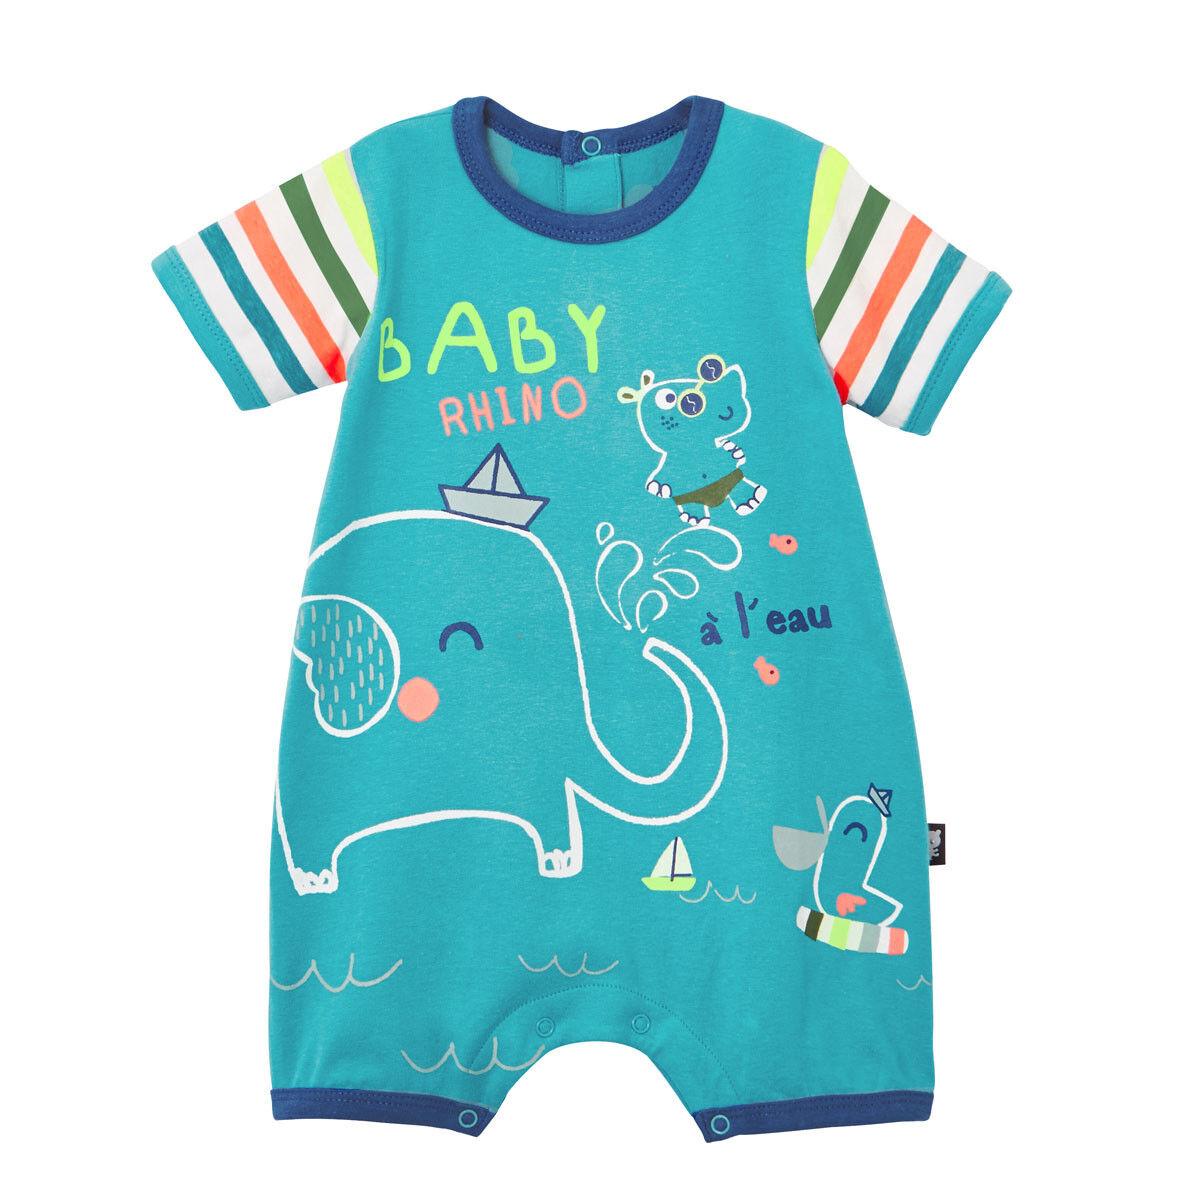 Petit Béguin Barboteuse bébé garçon Babyrhino - Taille - 6 mois